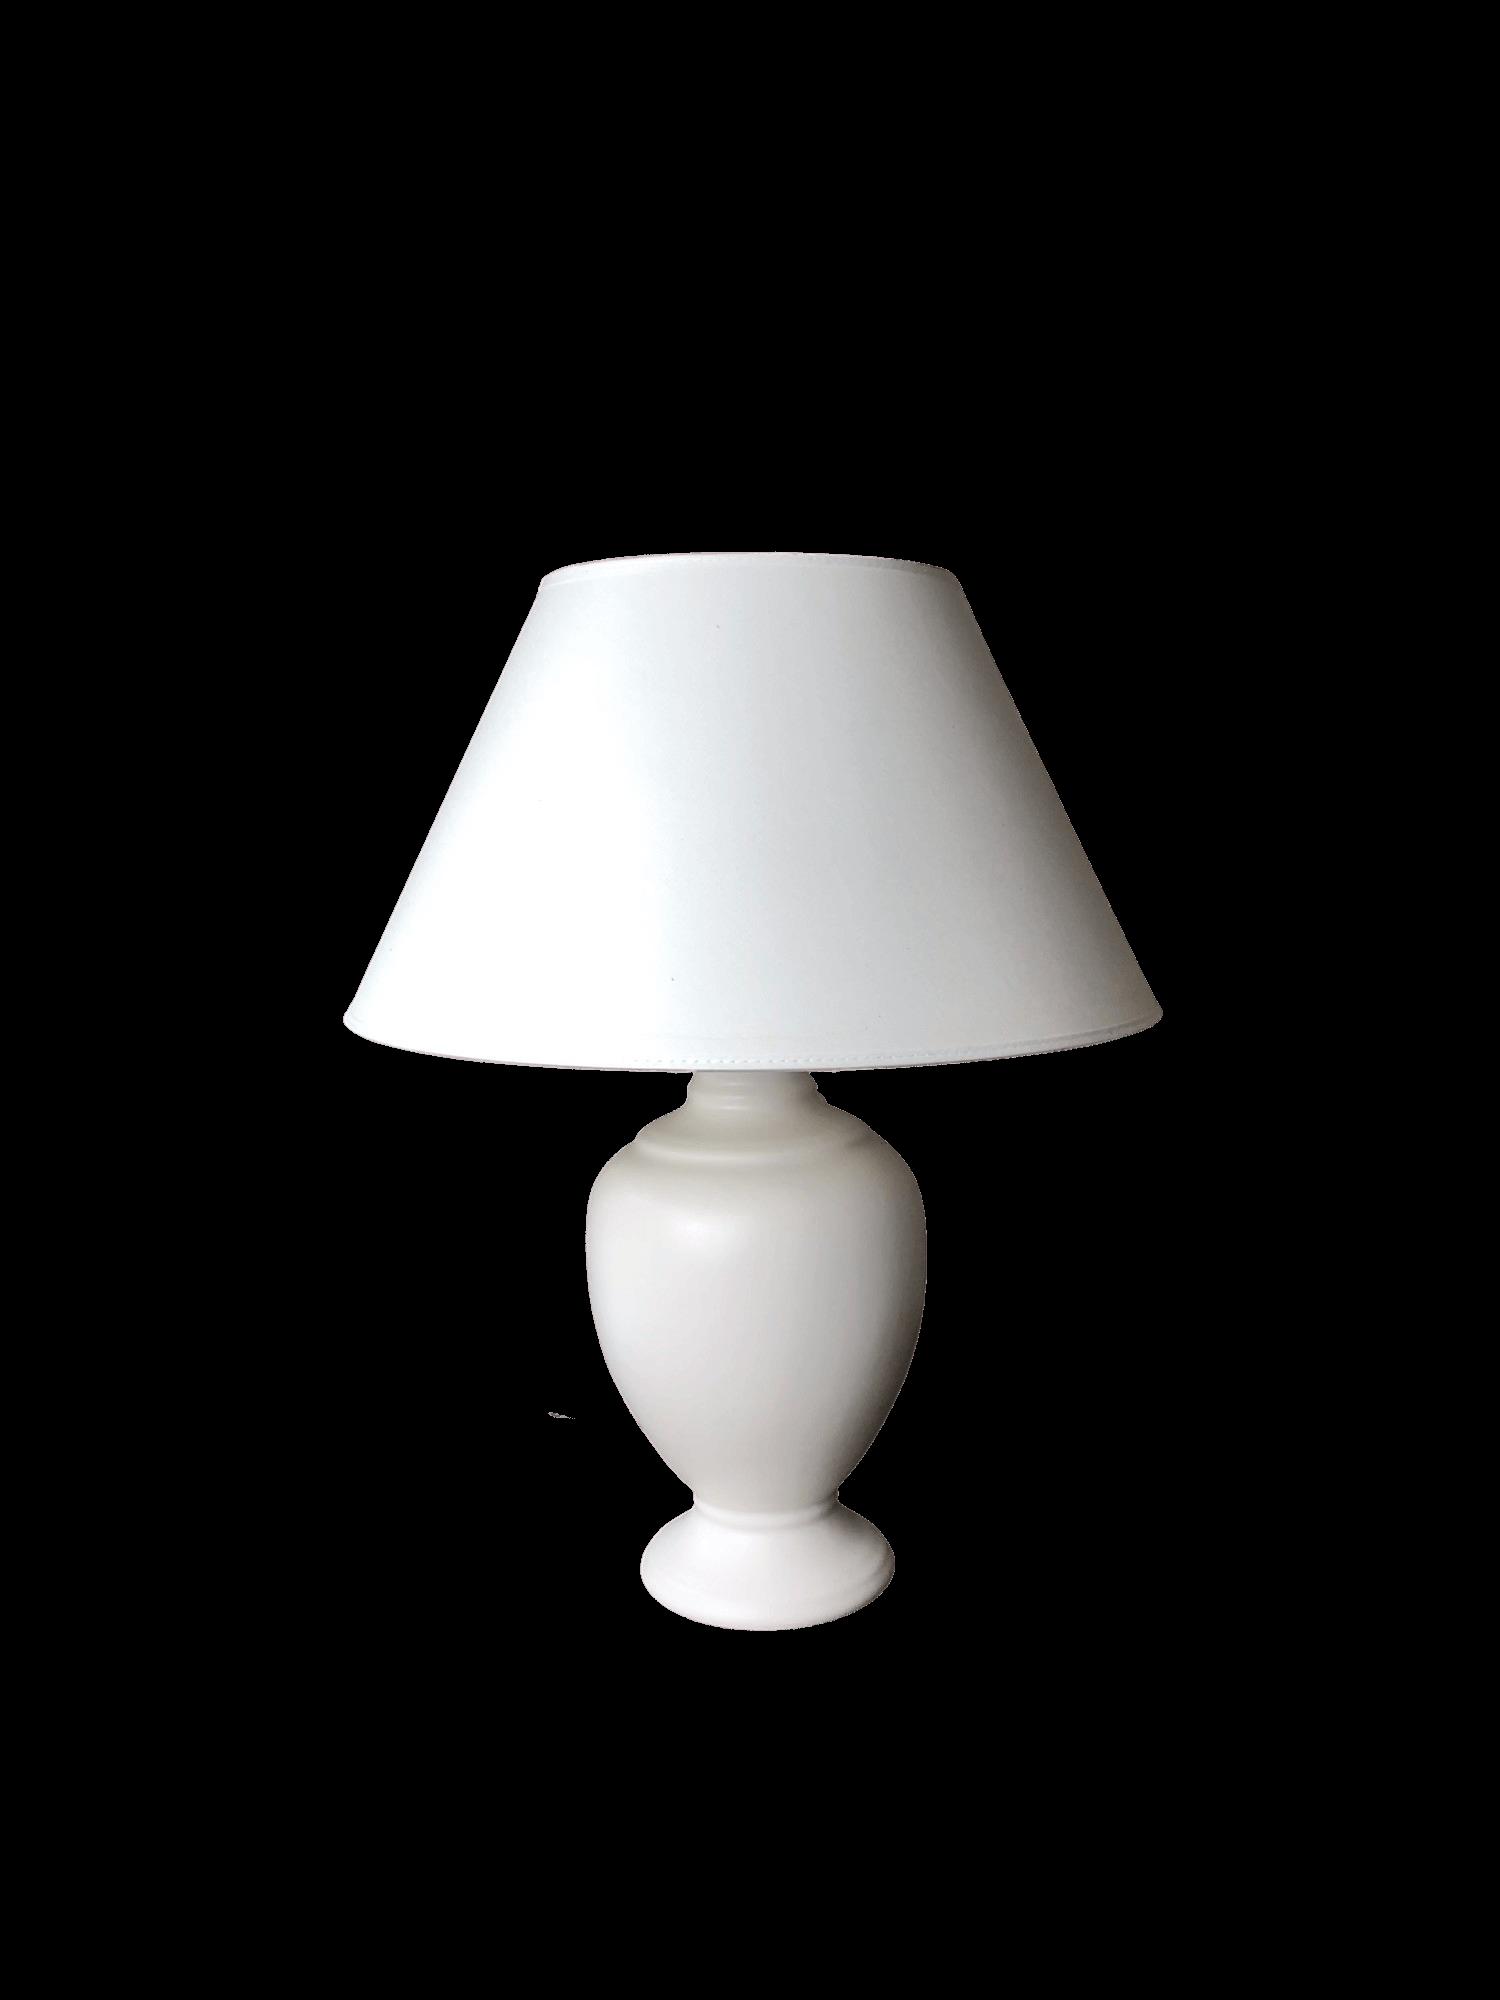 Lampa Amfora Mała Biała Matowa